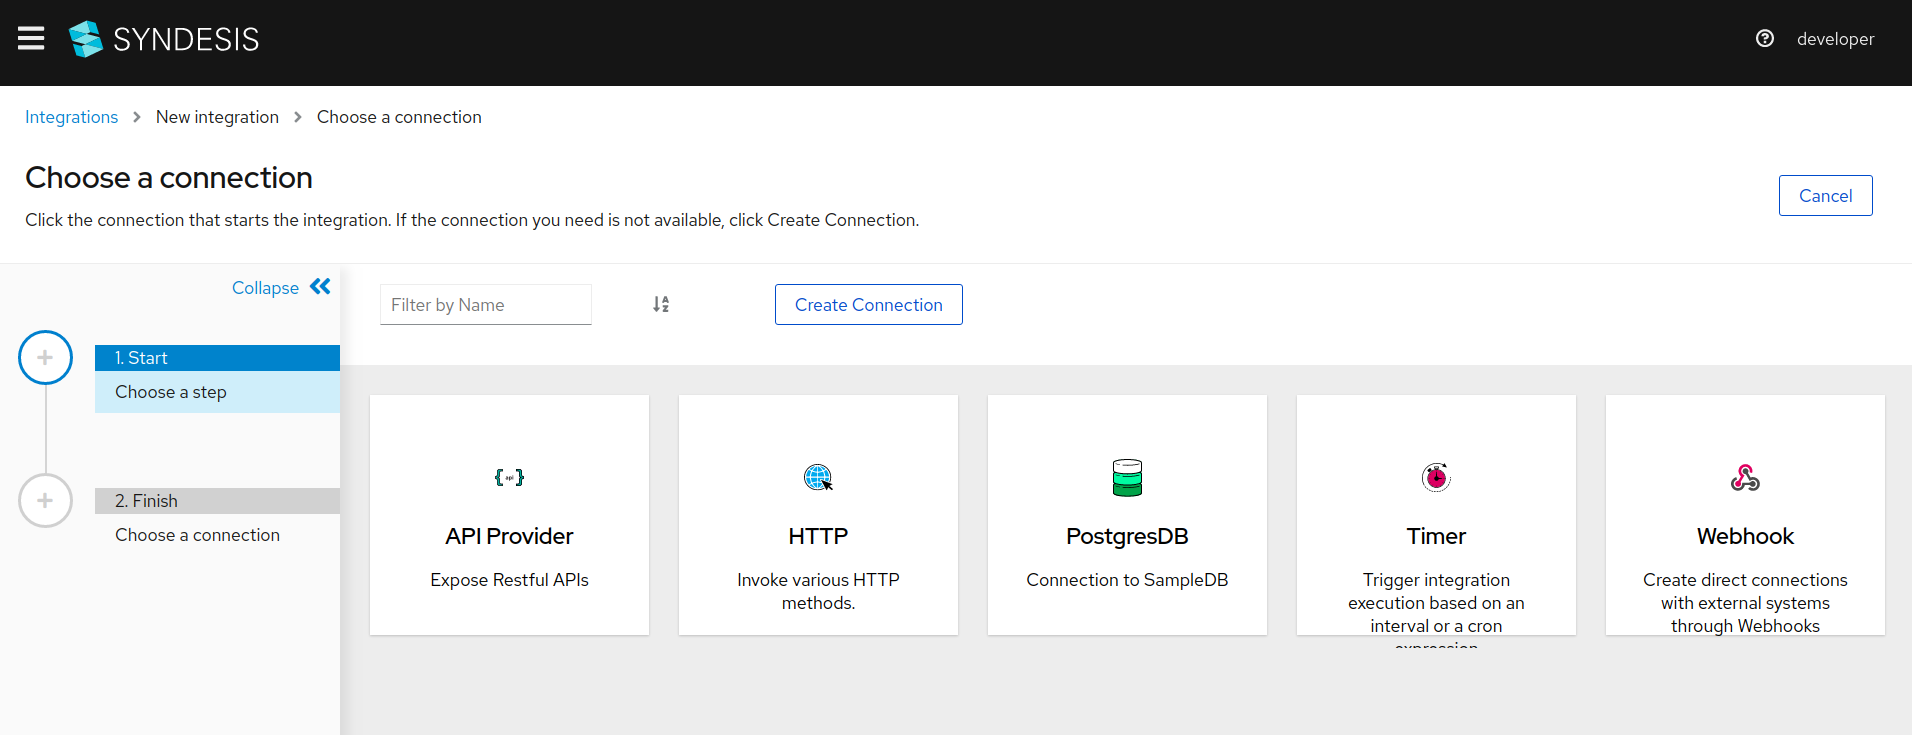 Choosing Webhook connection